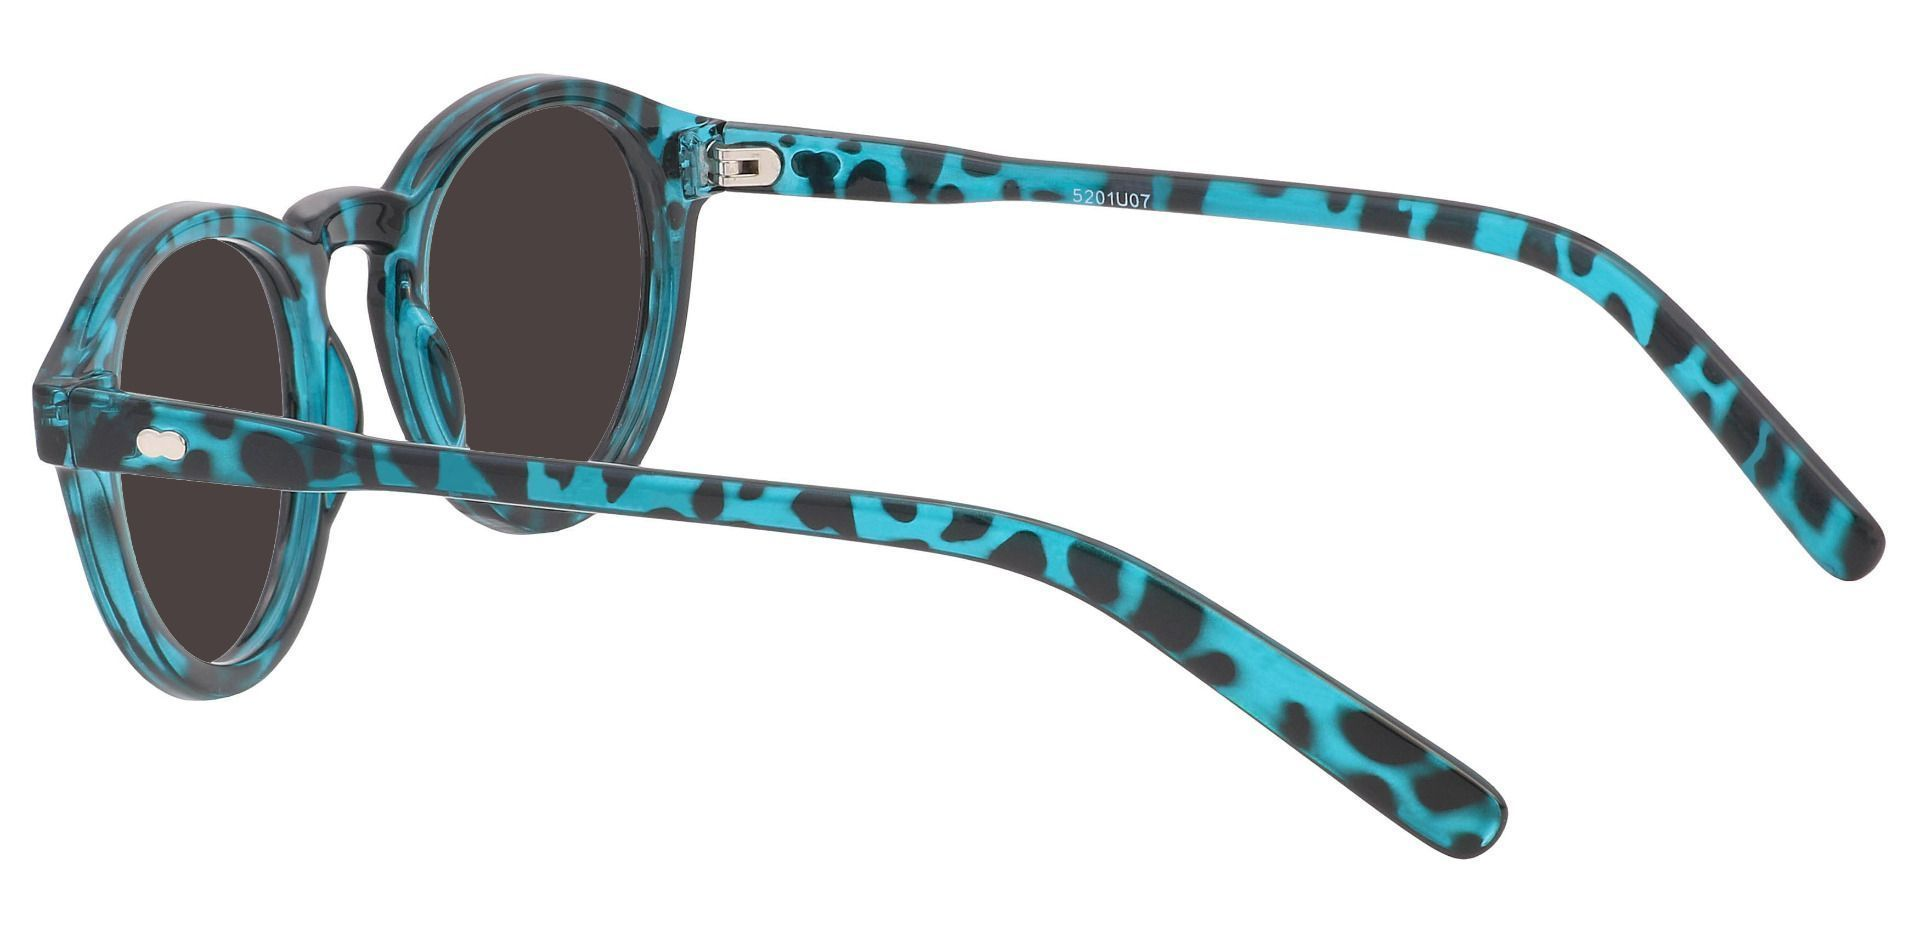 Vee Round Prescription Sunglasses - Green Frame With Gray Lenses